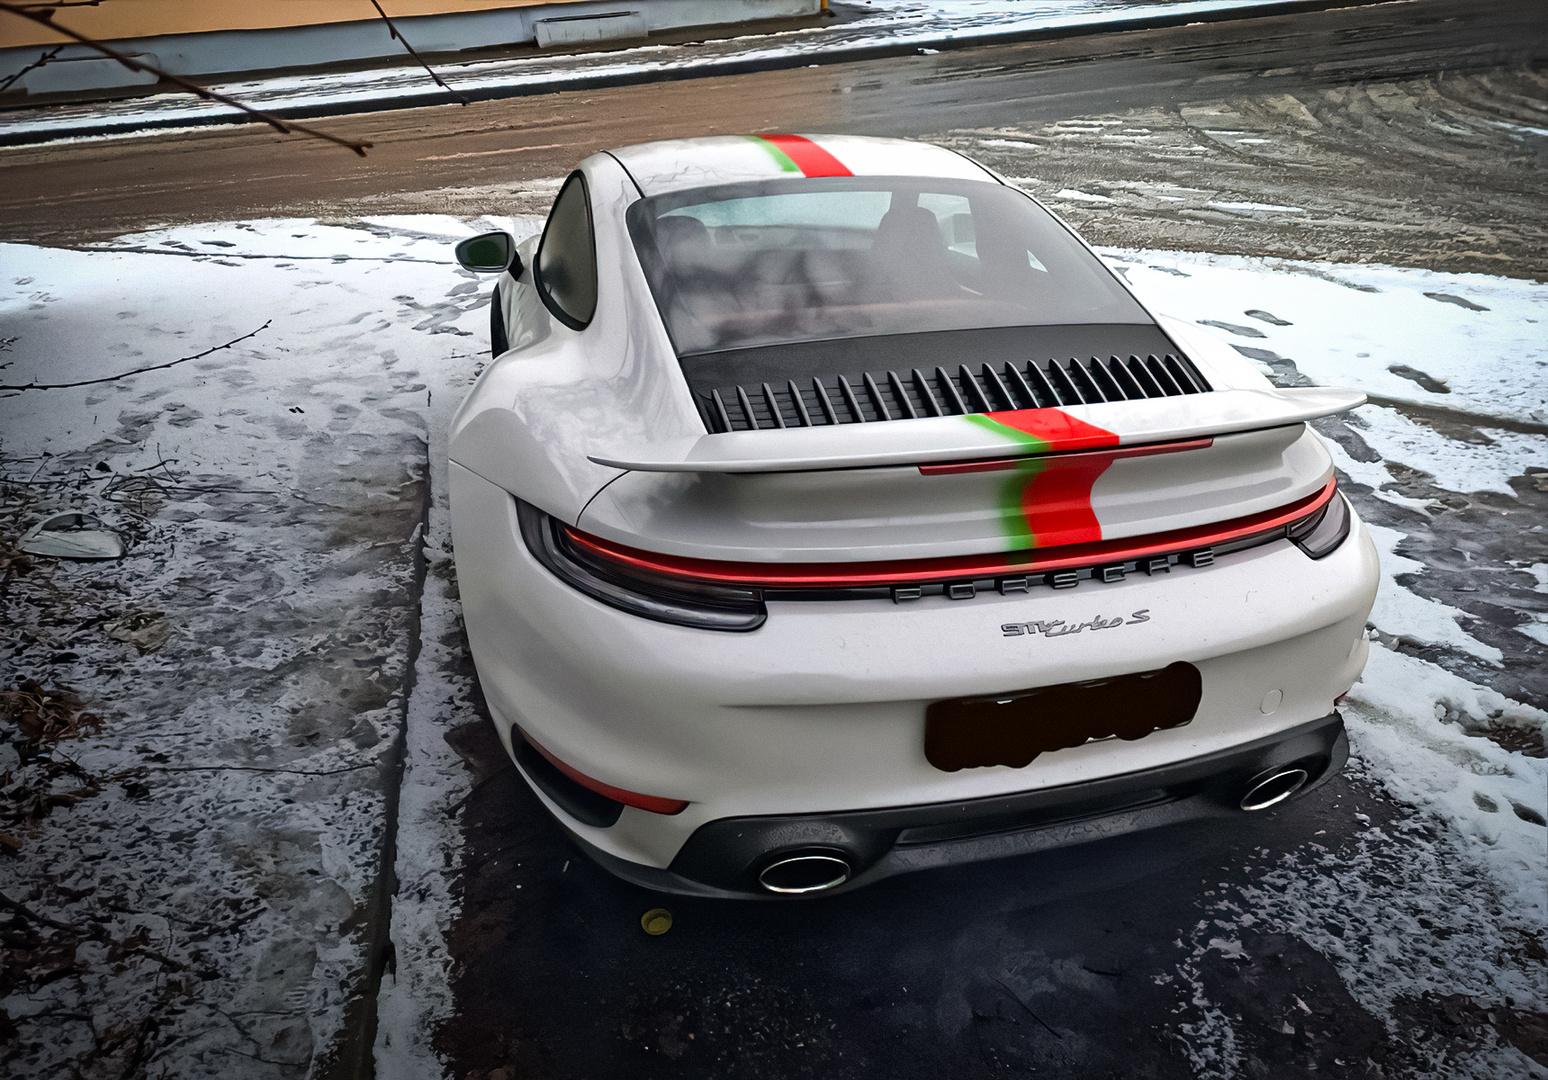 В Белоруссии разбили Porsche 911 за 20 млн рублей за наклейки